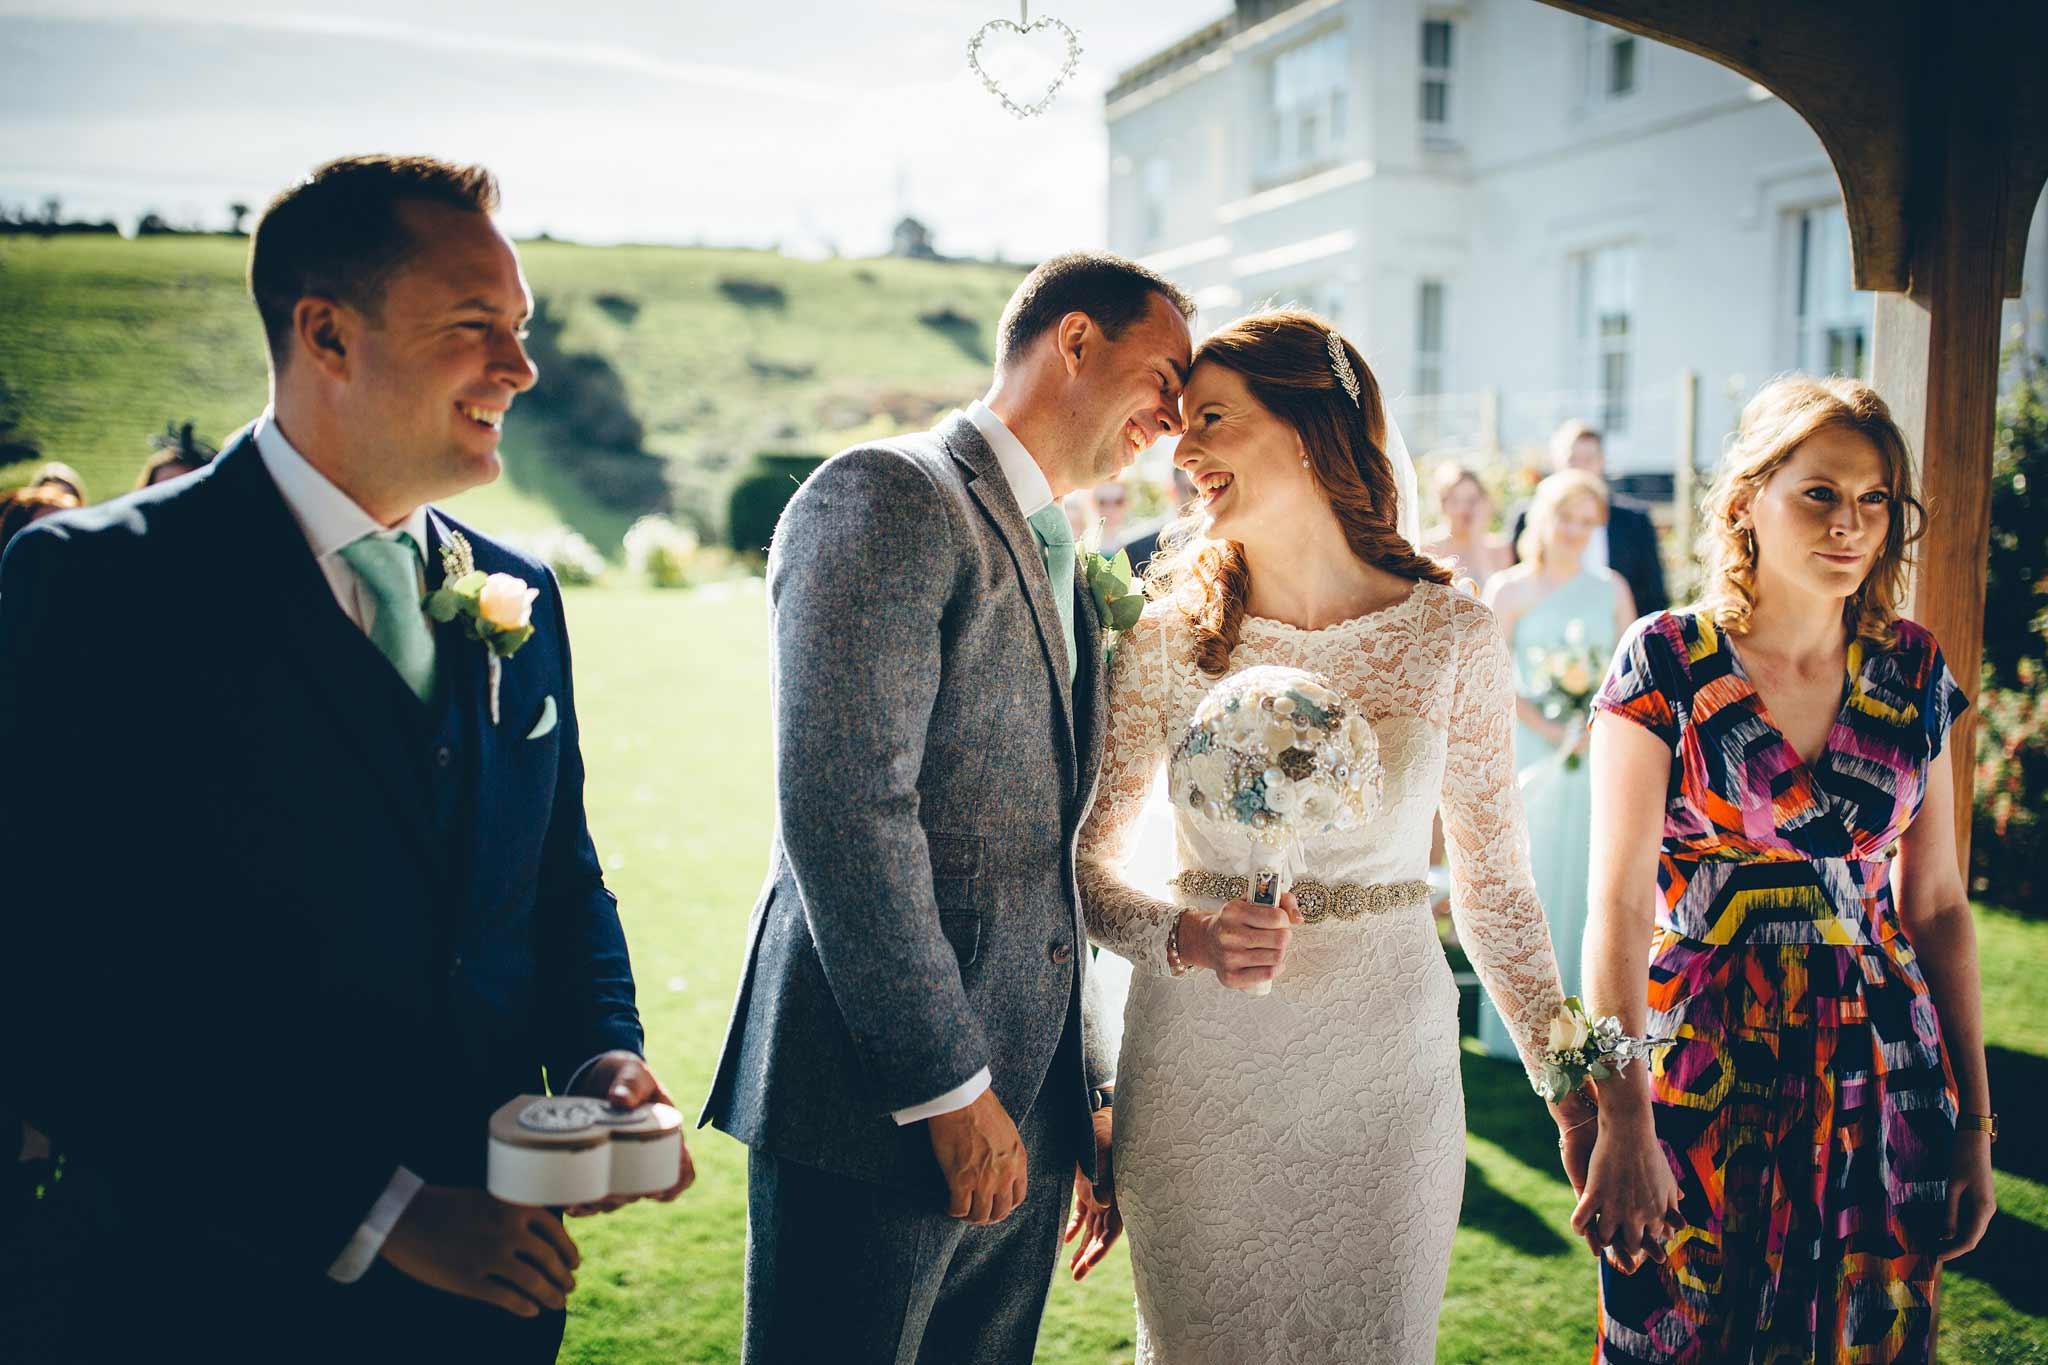 Polpier and Penpol Wedding Photographer 23